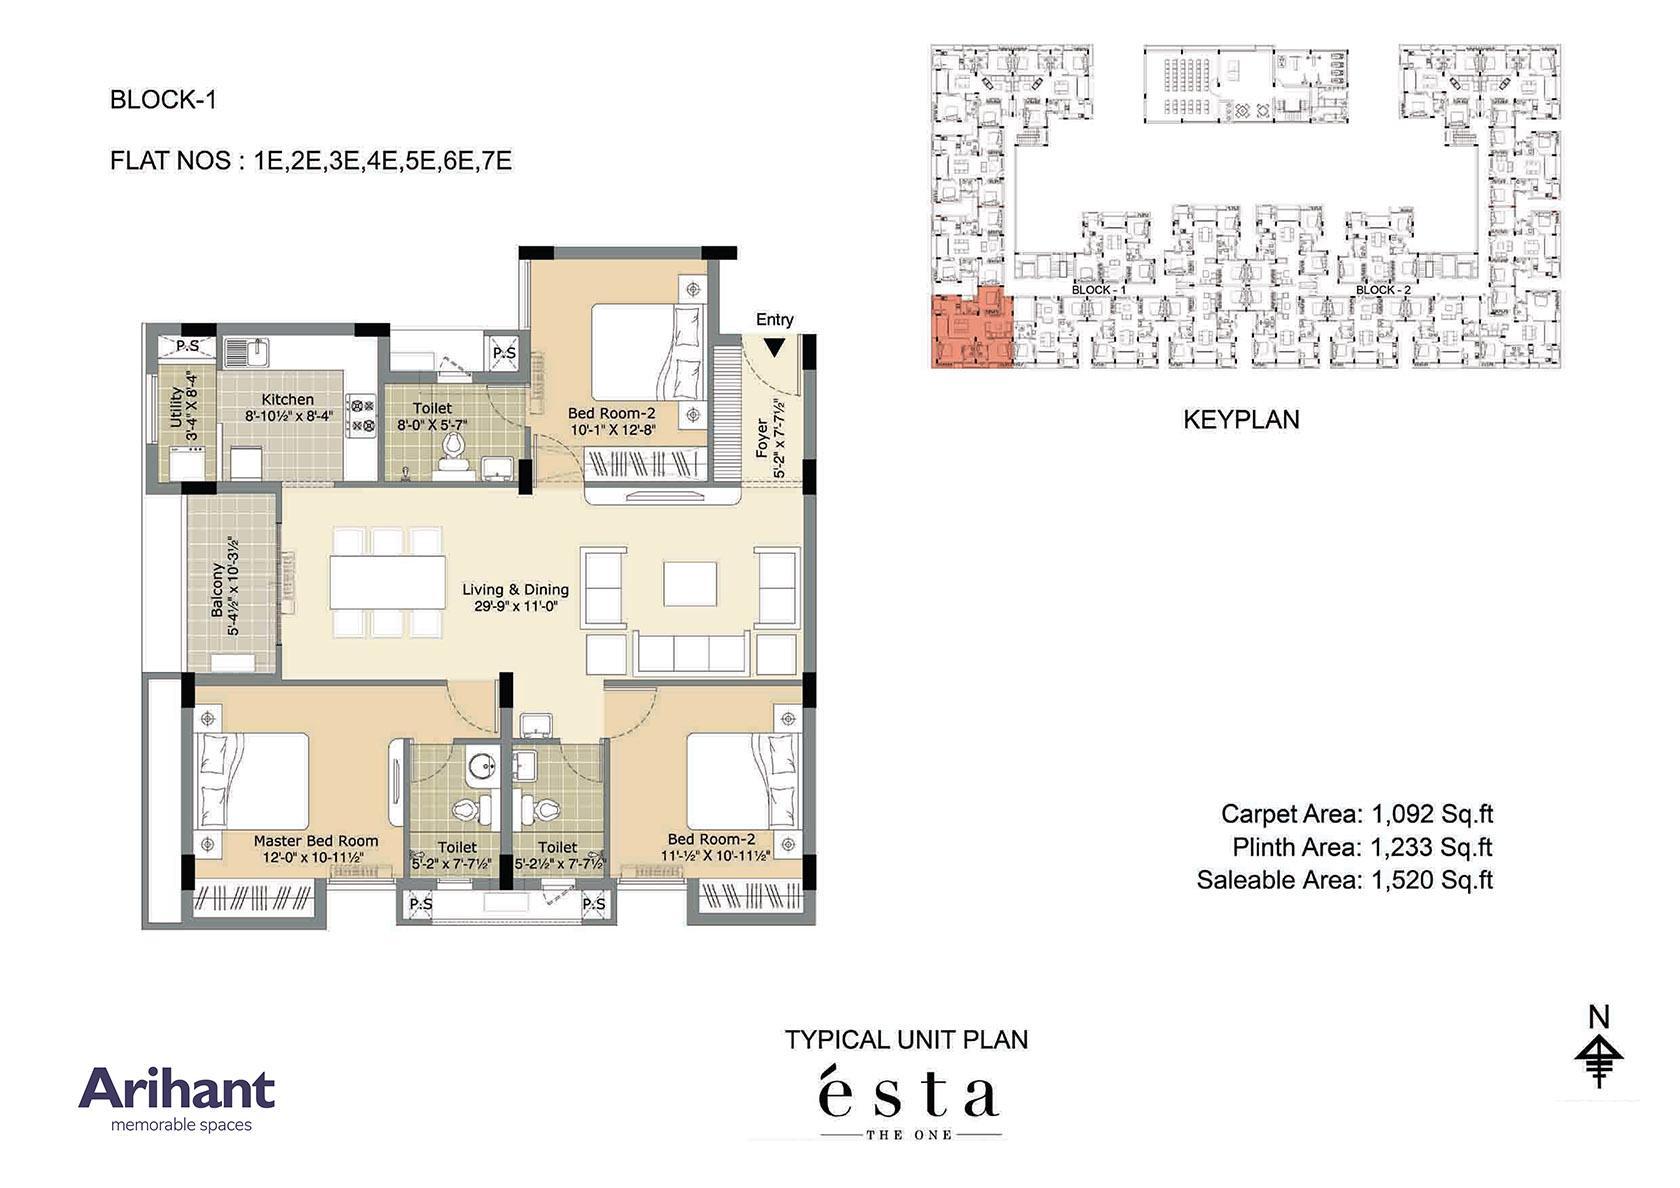 Arihant - Esta_Typical Unit Plan - Block 1 - Type E